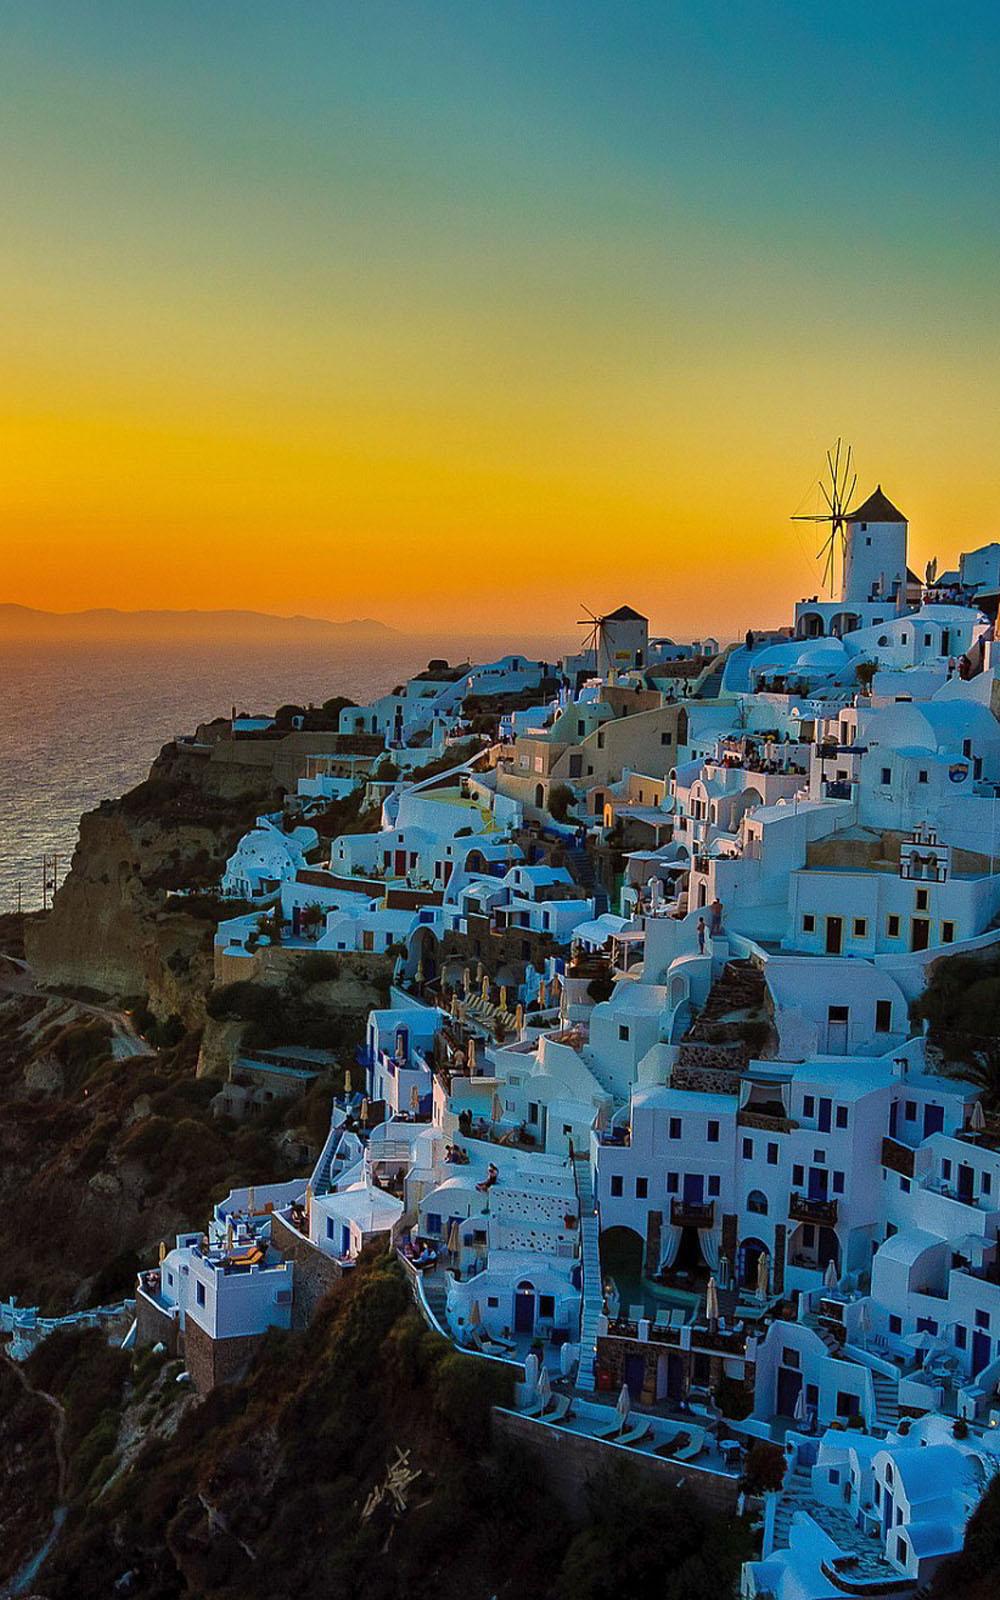 Whatsapp Car Wallpaper Download Sunset View Of Santorini Island Download Free Hd Mobile